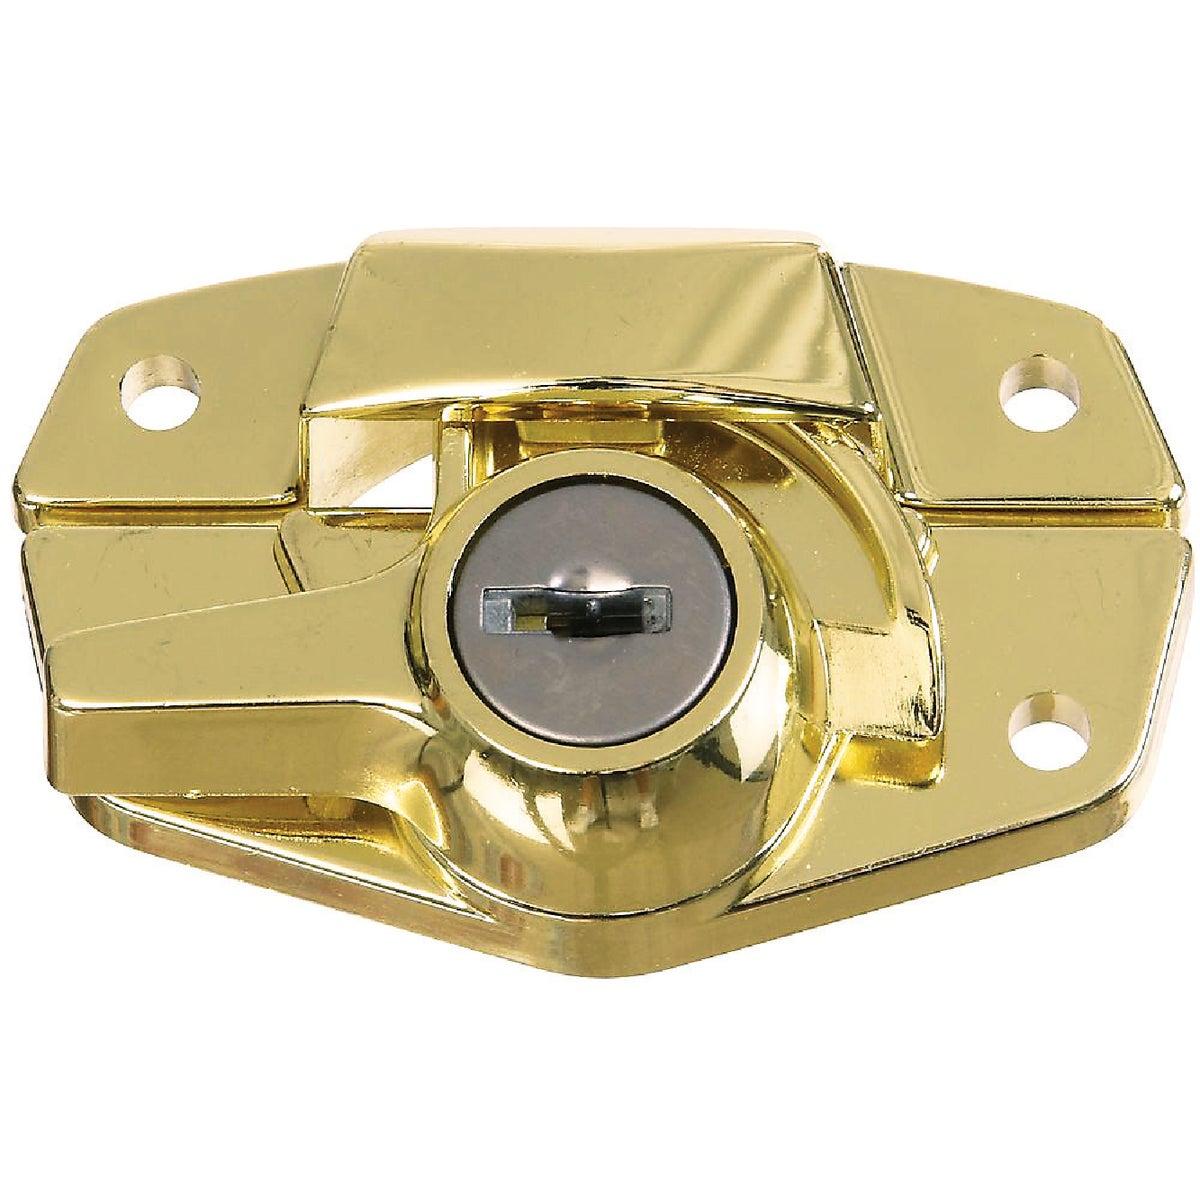 BRS KEYED SASH LOCK - N183723 by National Mfg Co